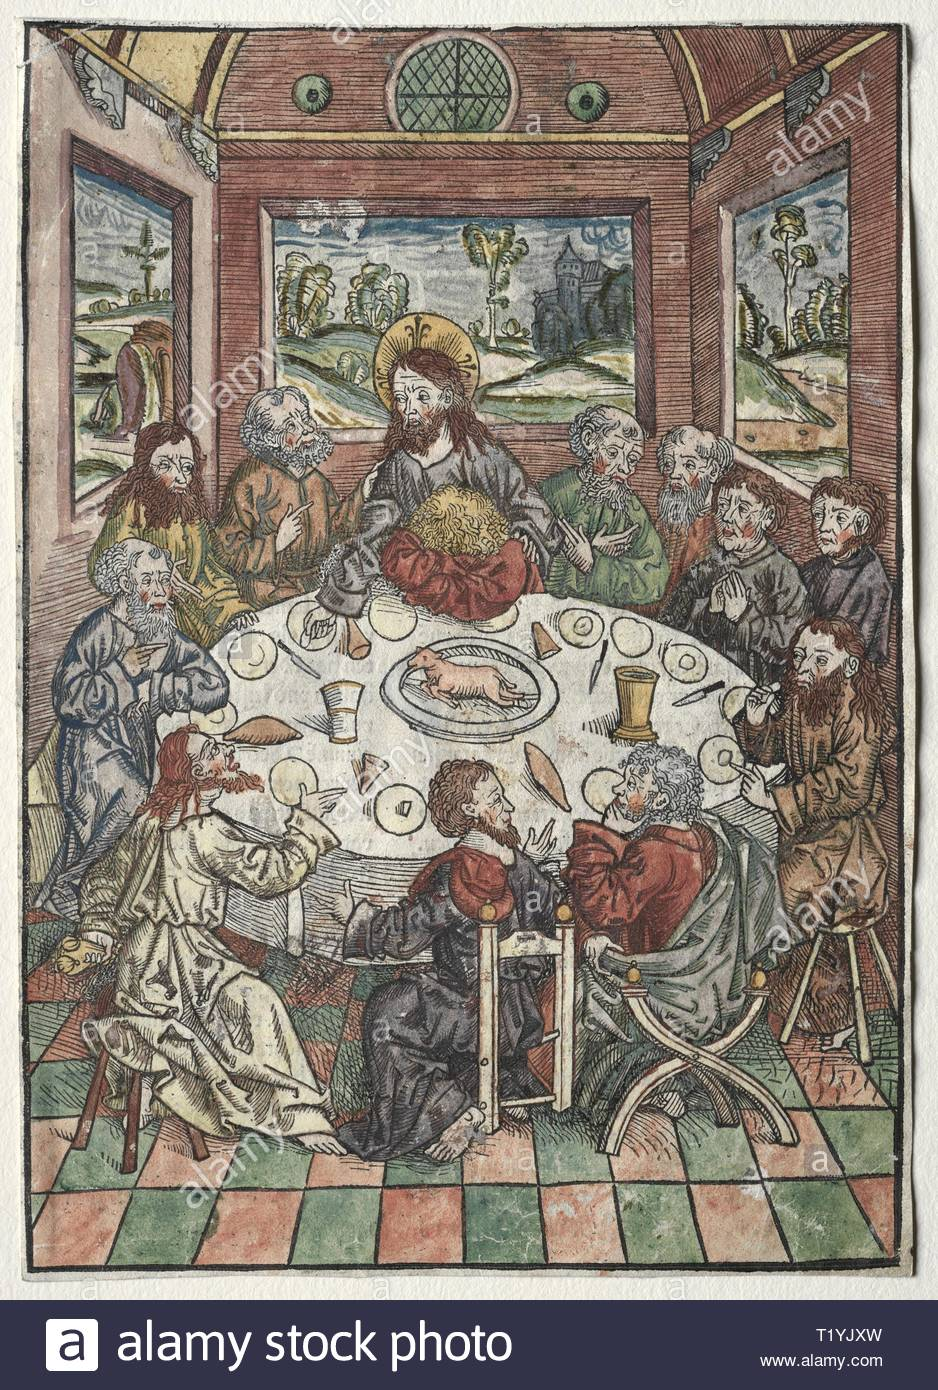 Der Schatzbehalter: The Last Supper, 1491. Michael Wolgemut (German, 1434-1519). Color woodcut. - Stock Image